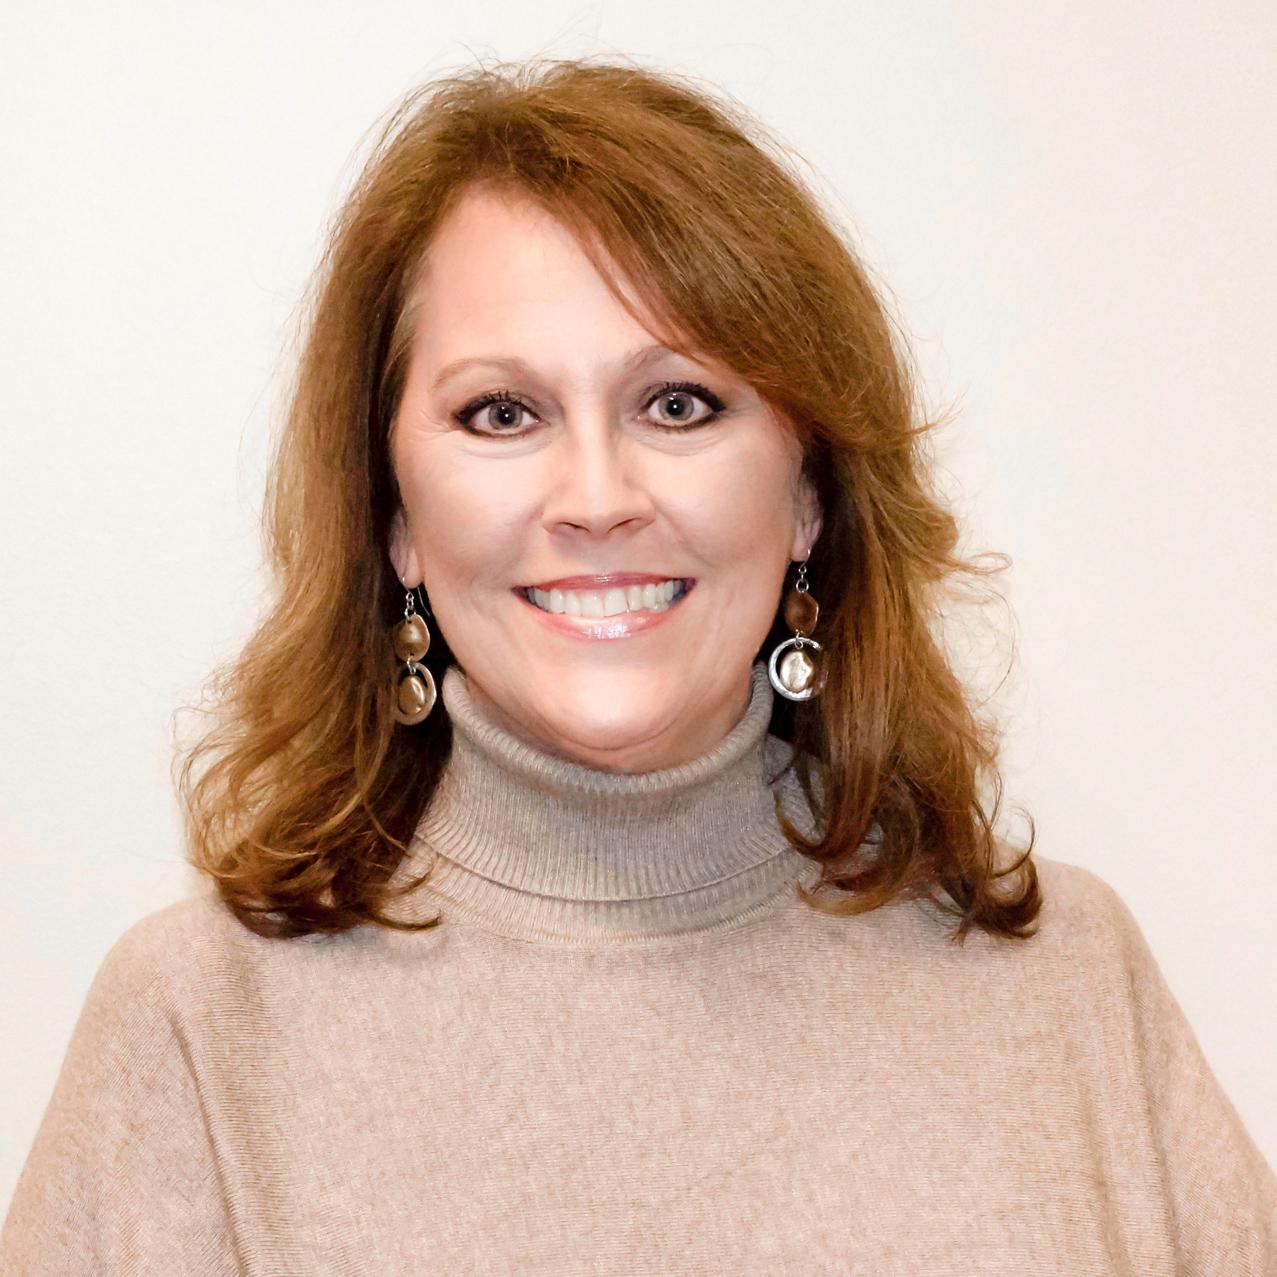 Laura Dennis, M.S, CCC-SLP